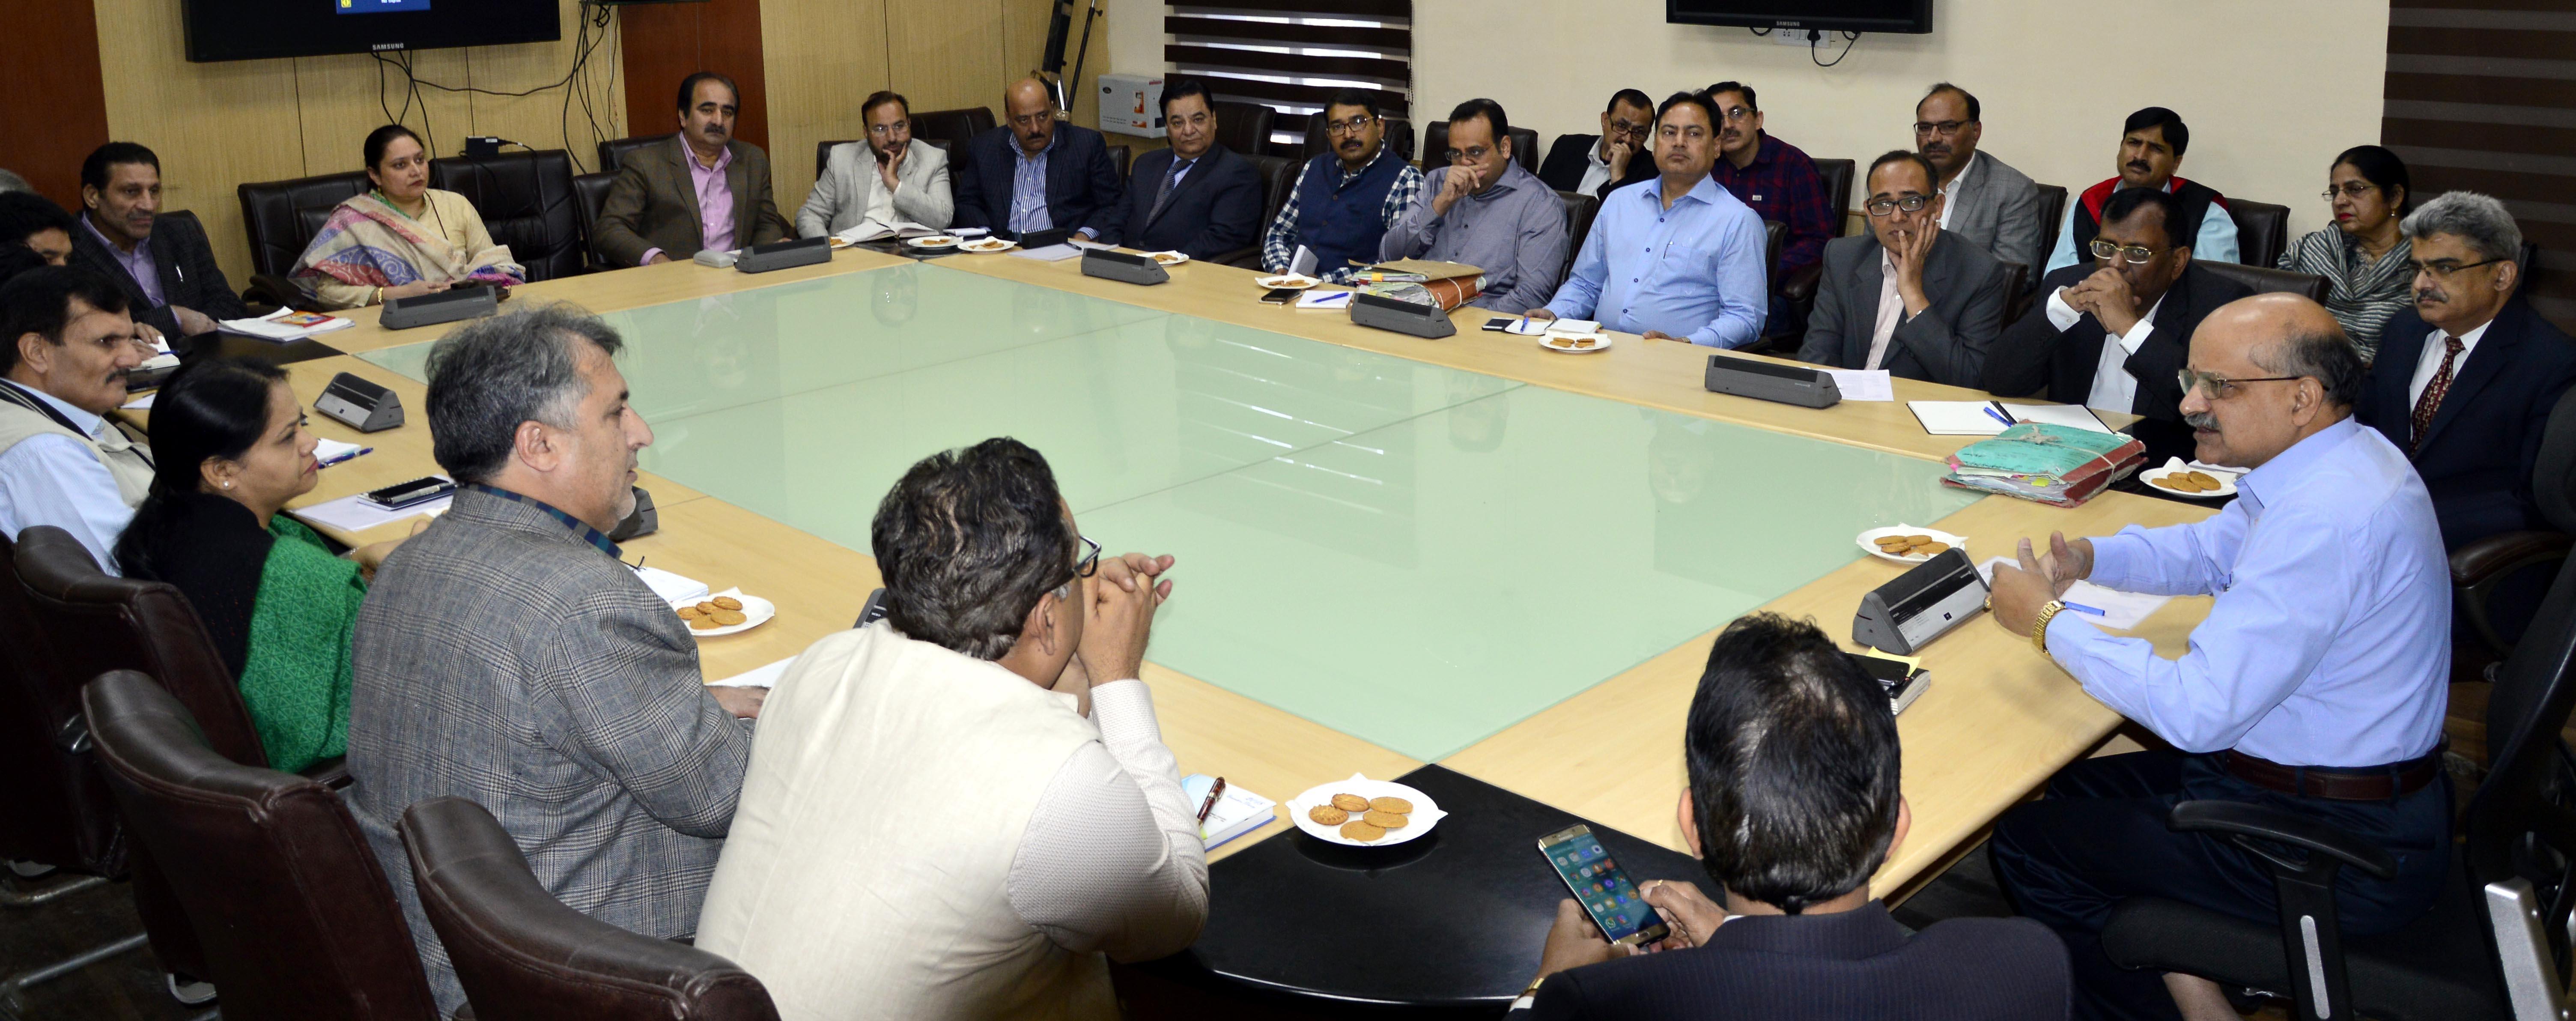 Chief Secretary addressing a meeting of administrative secretaries at civil secretariat Srinagar -Pic/Kashmir Horizon